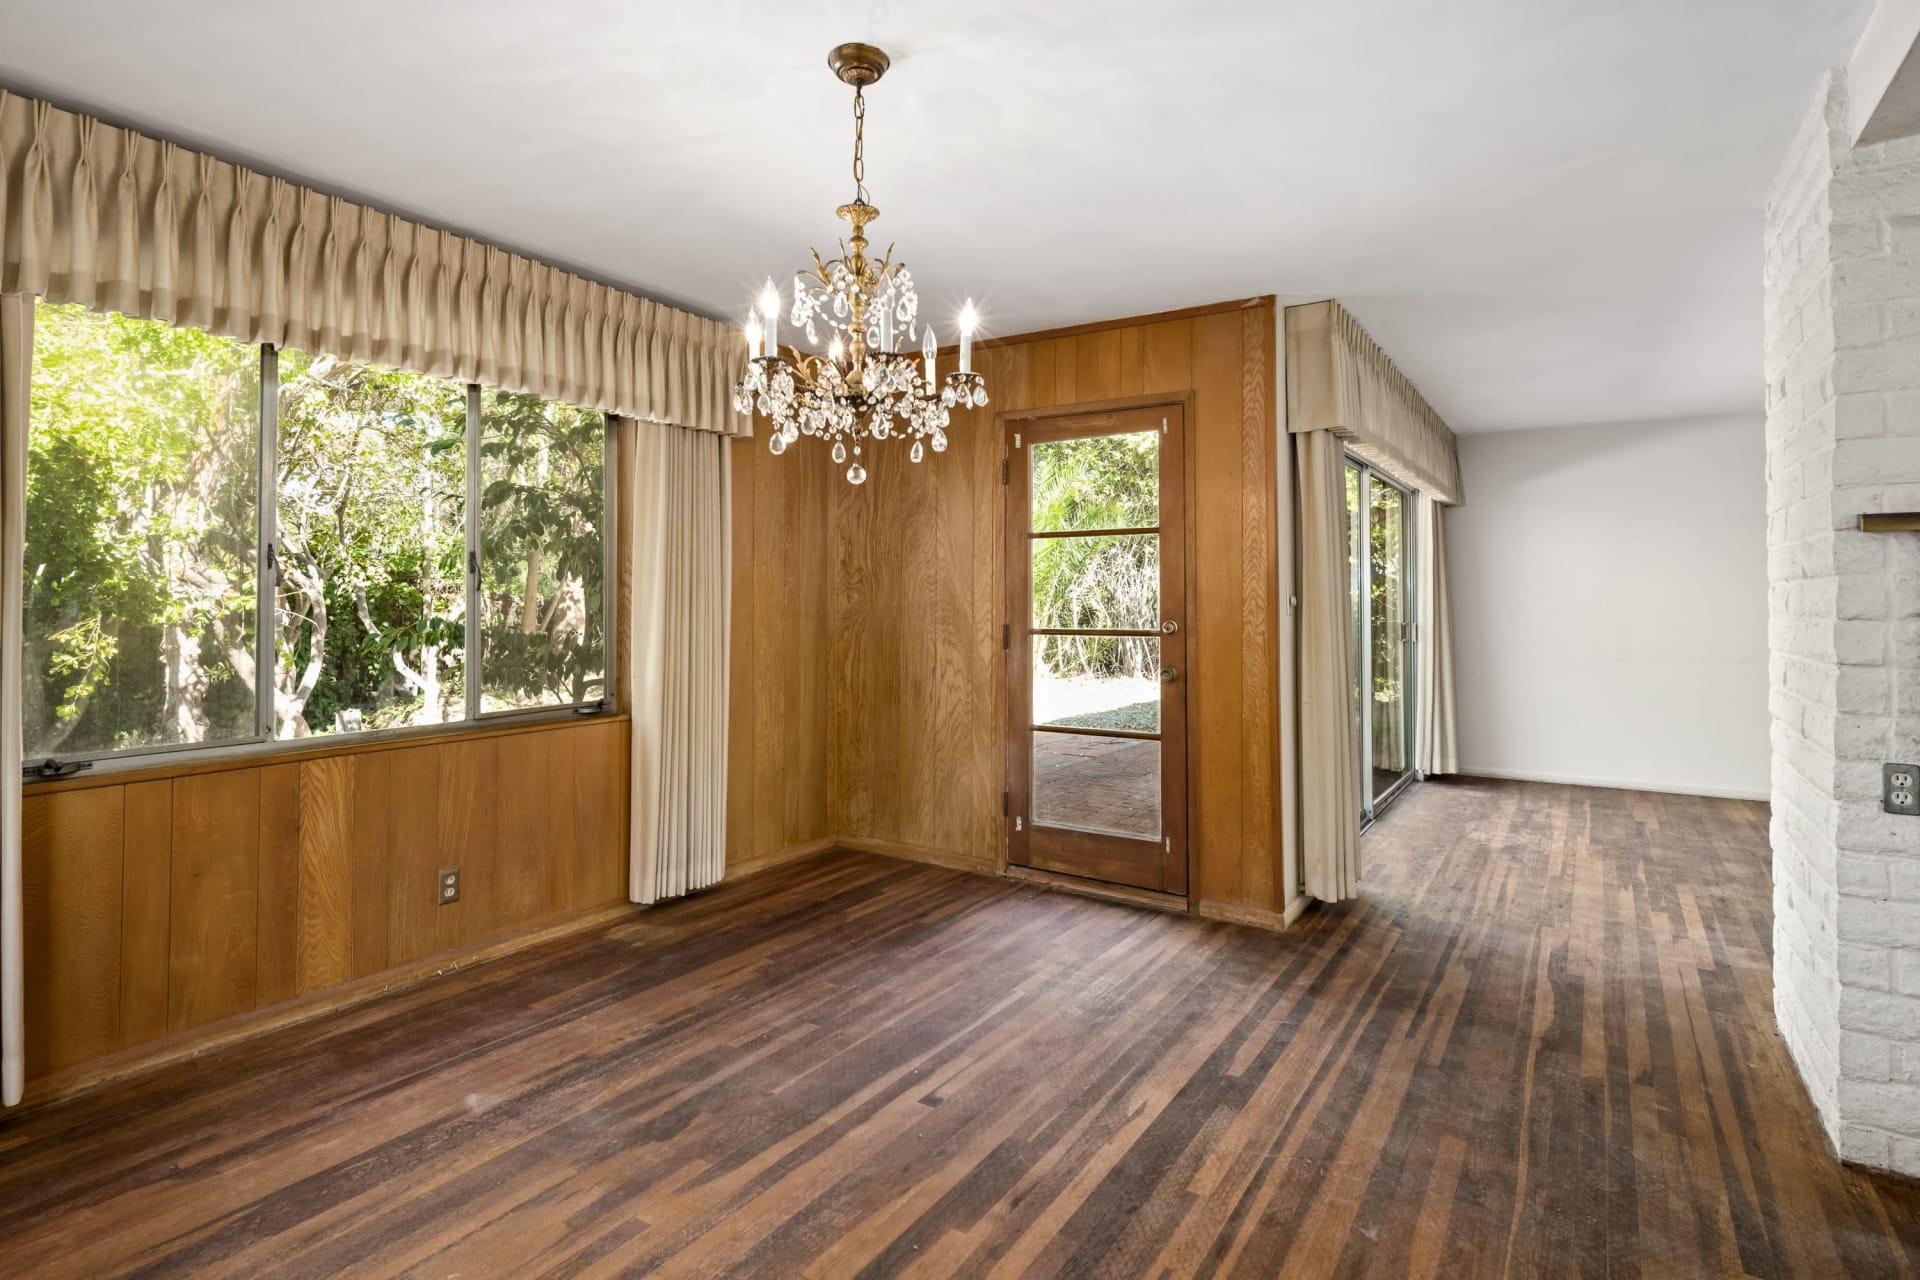 2217 Via Fernandez Palos Verdes Estates photo